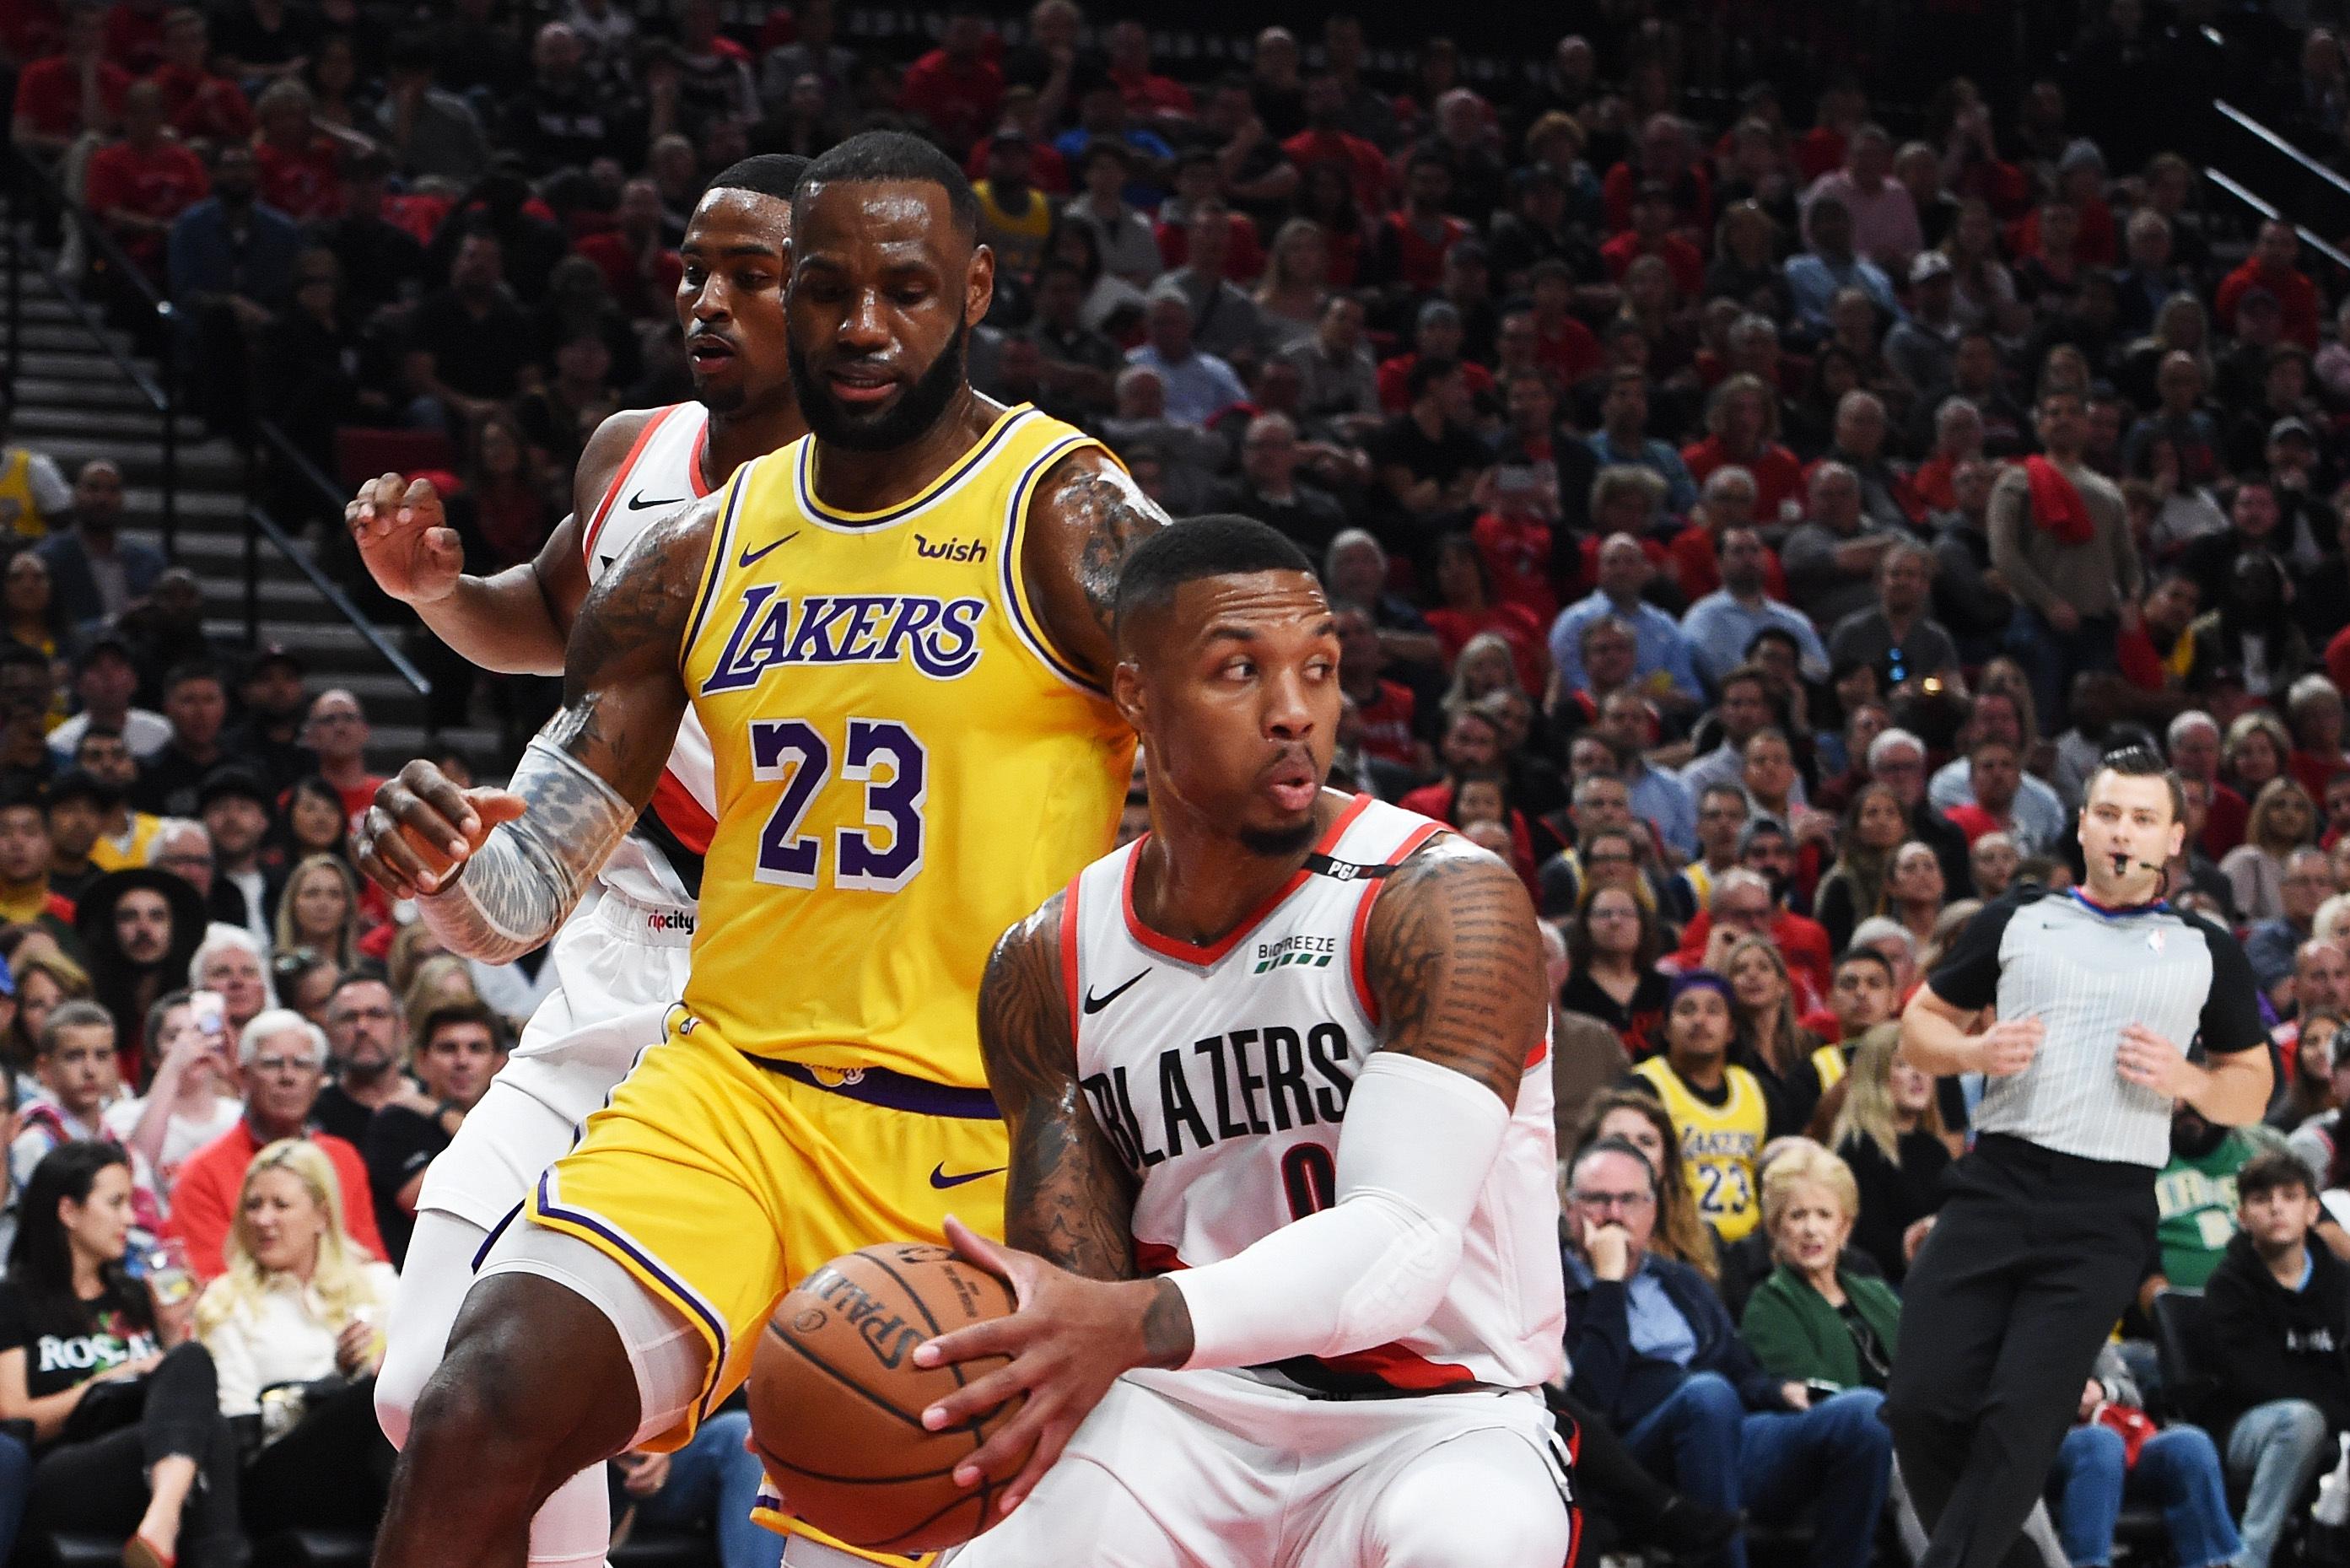 Lillard的激將法奏效了,聯盟發聲:考慮讓鵜鶘、拓荒者、馬刺、國王爭奪季後賽!-黑特籃球-NBA新聞影音圖片分享社區